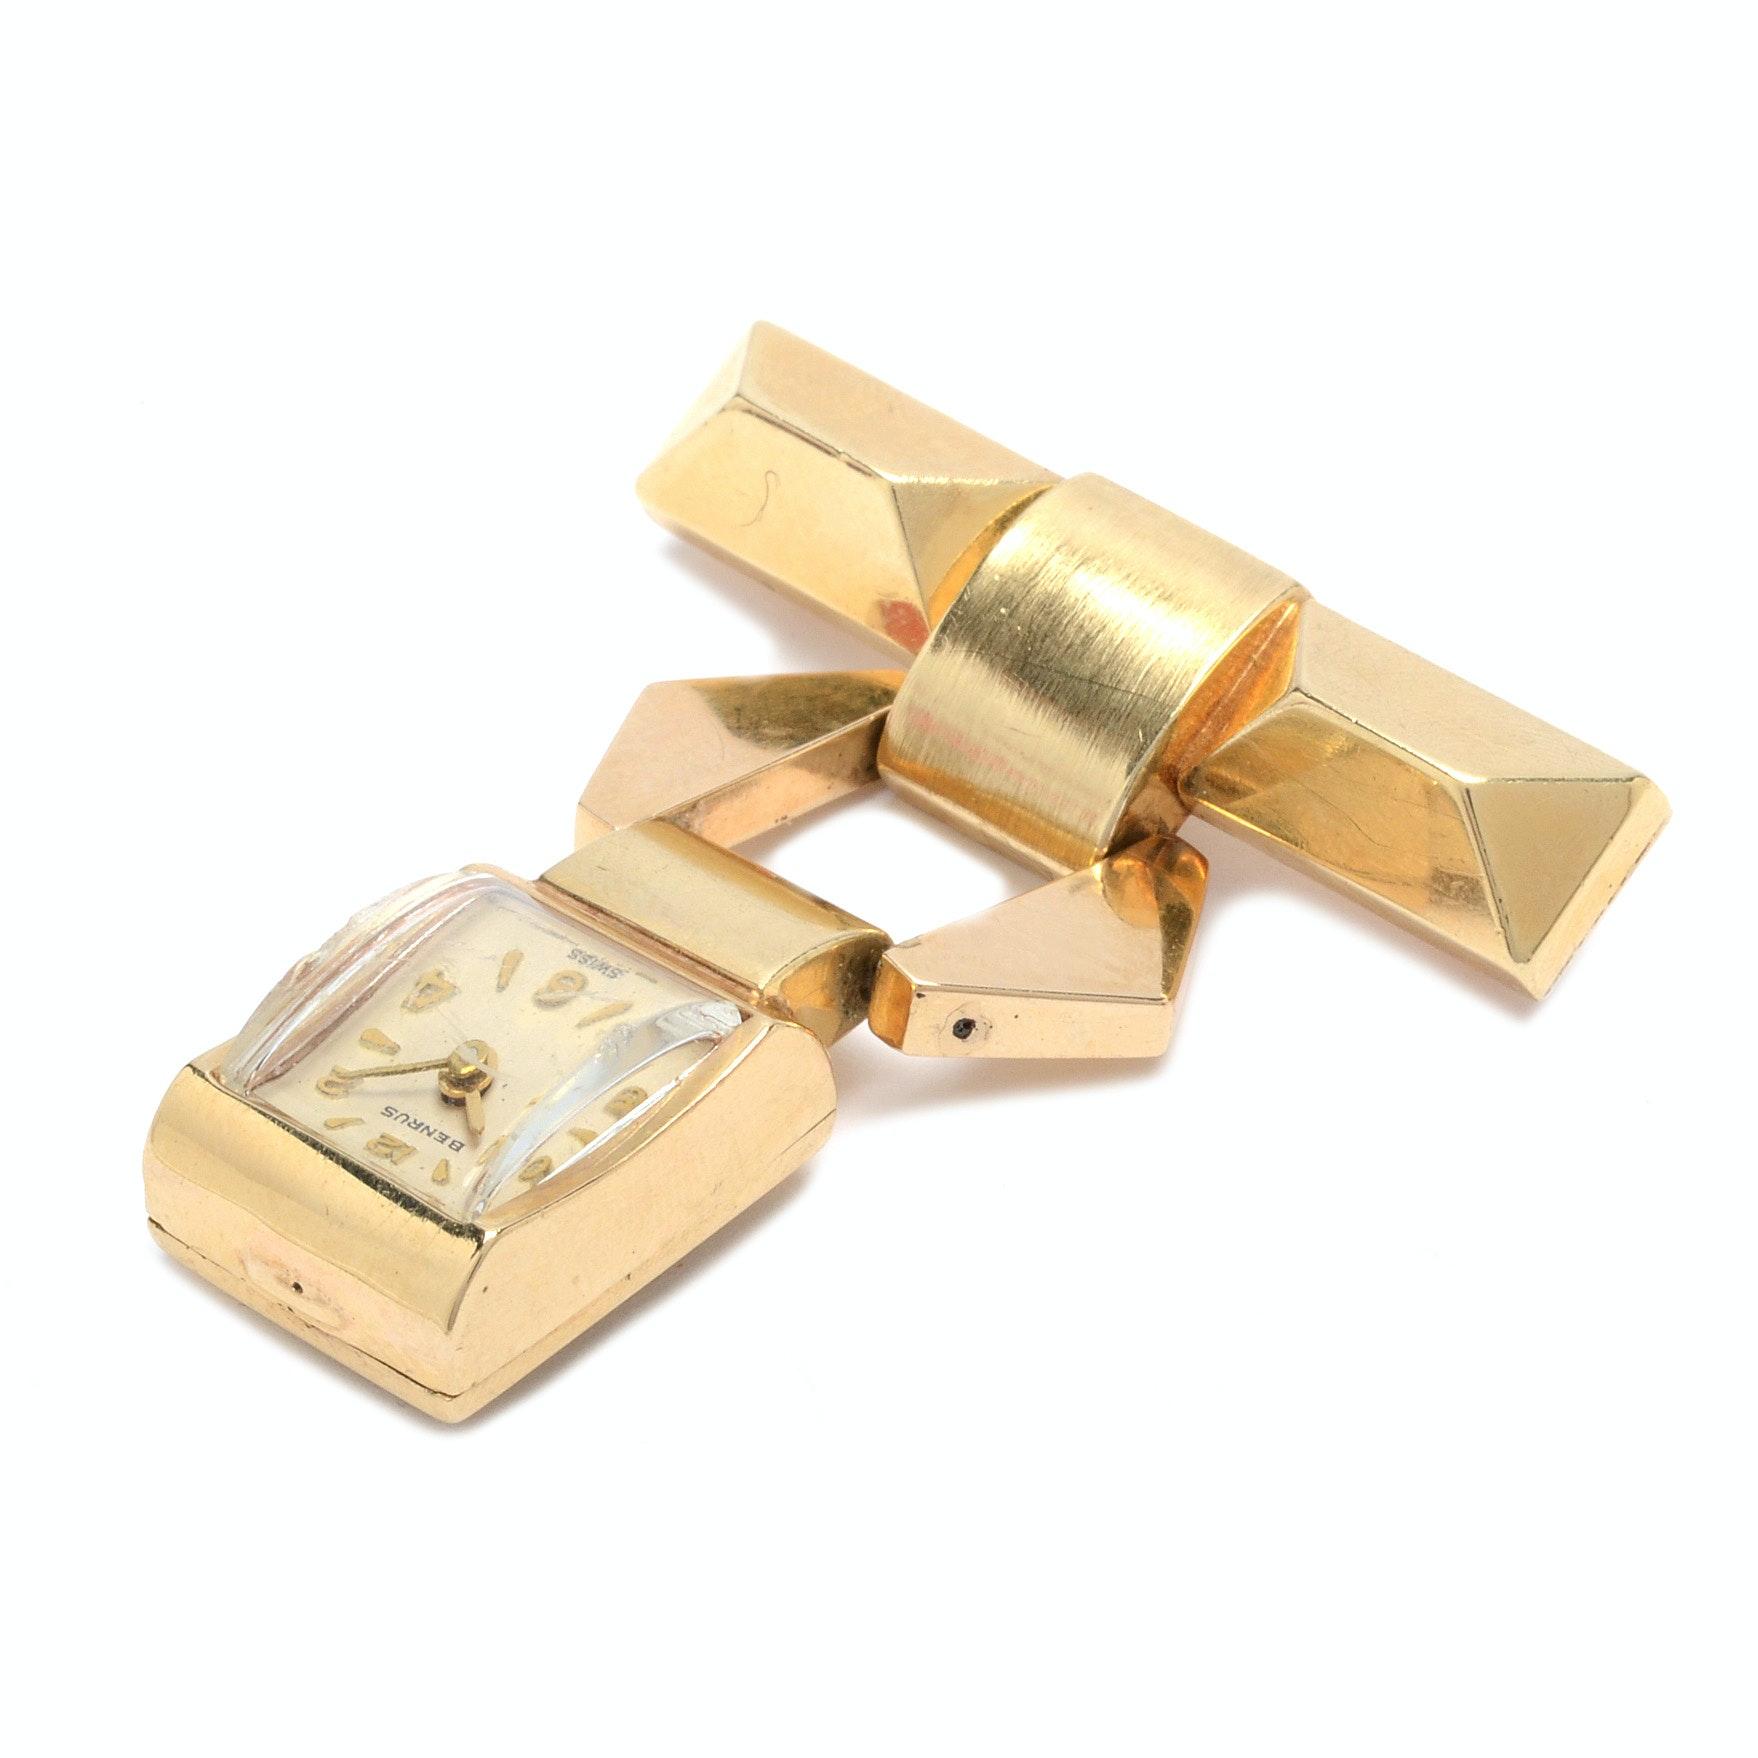 14K Yellow Gold Benrus Swiss Watch Pin